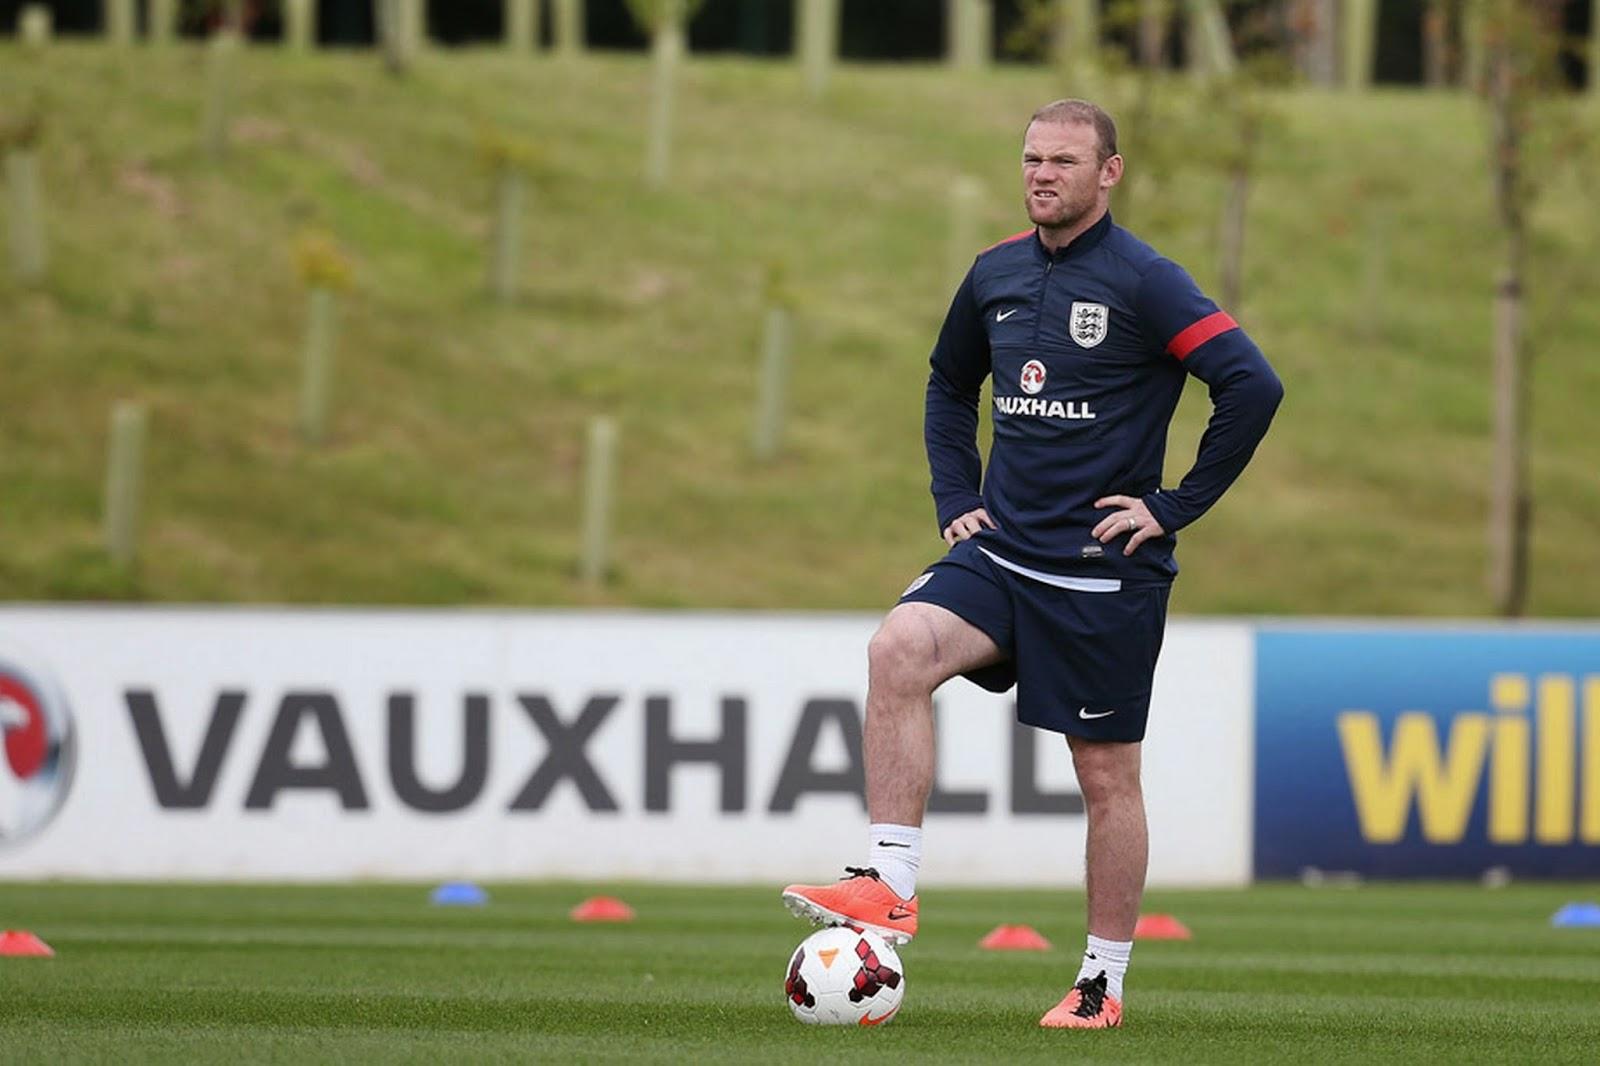 Rooney Lemparkan Sanjungan Tinggi Kepada Southgate